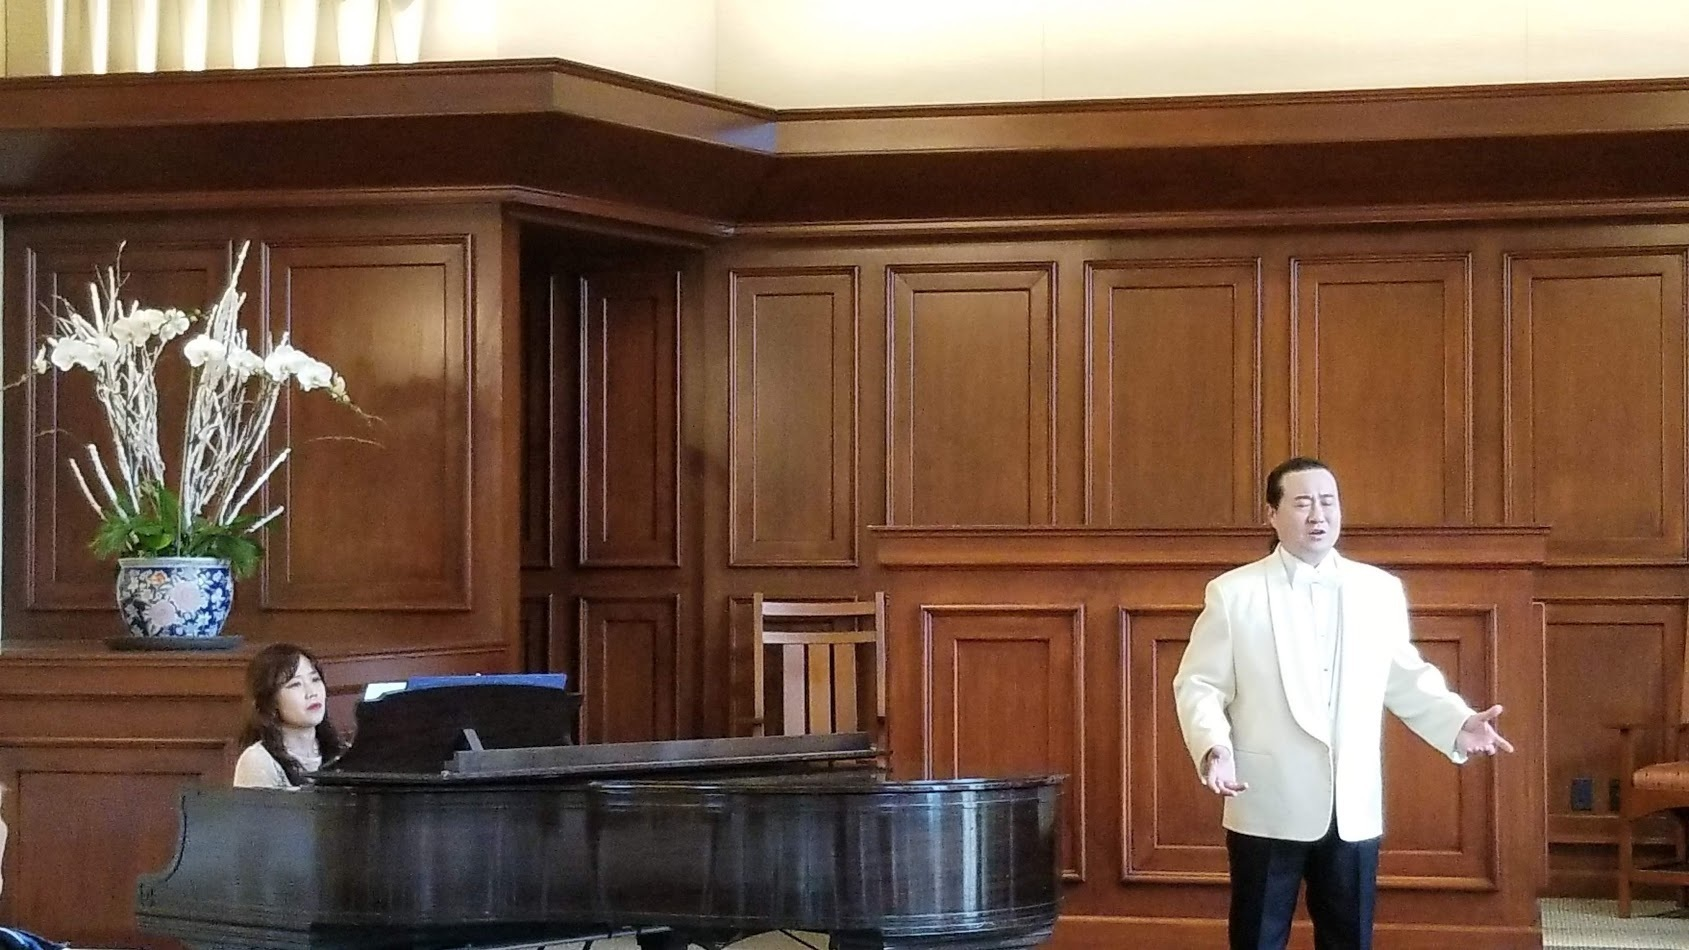 Peter jeon Concert - Peter singing.jpg